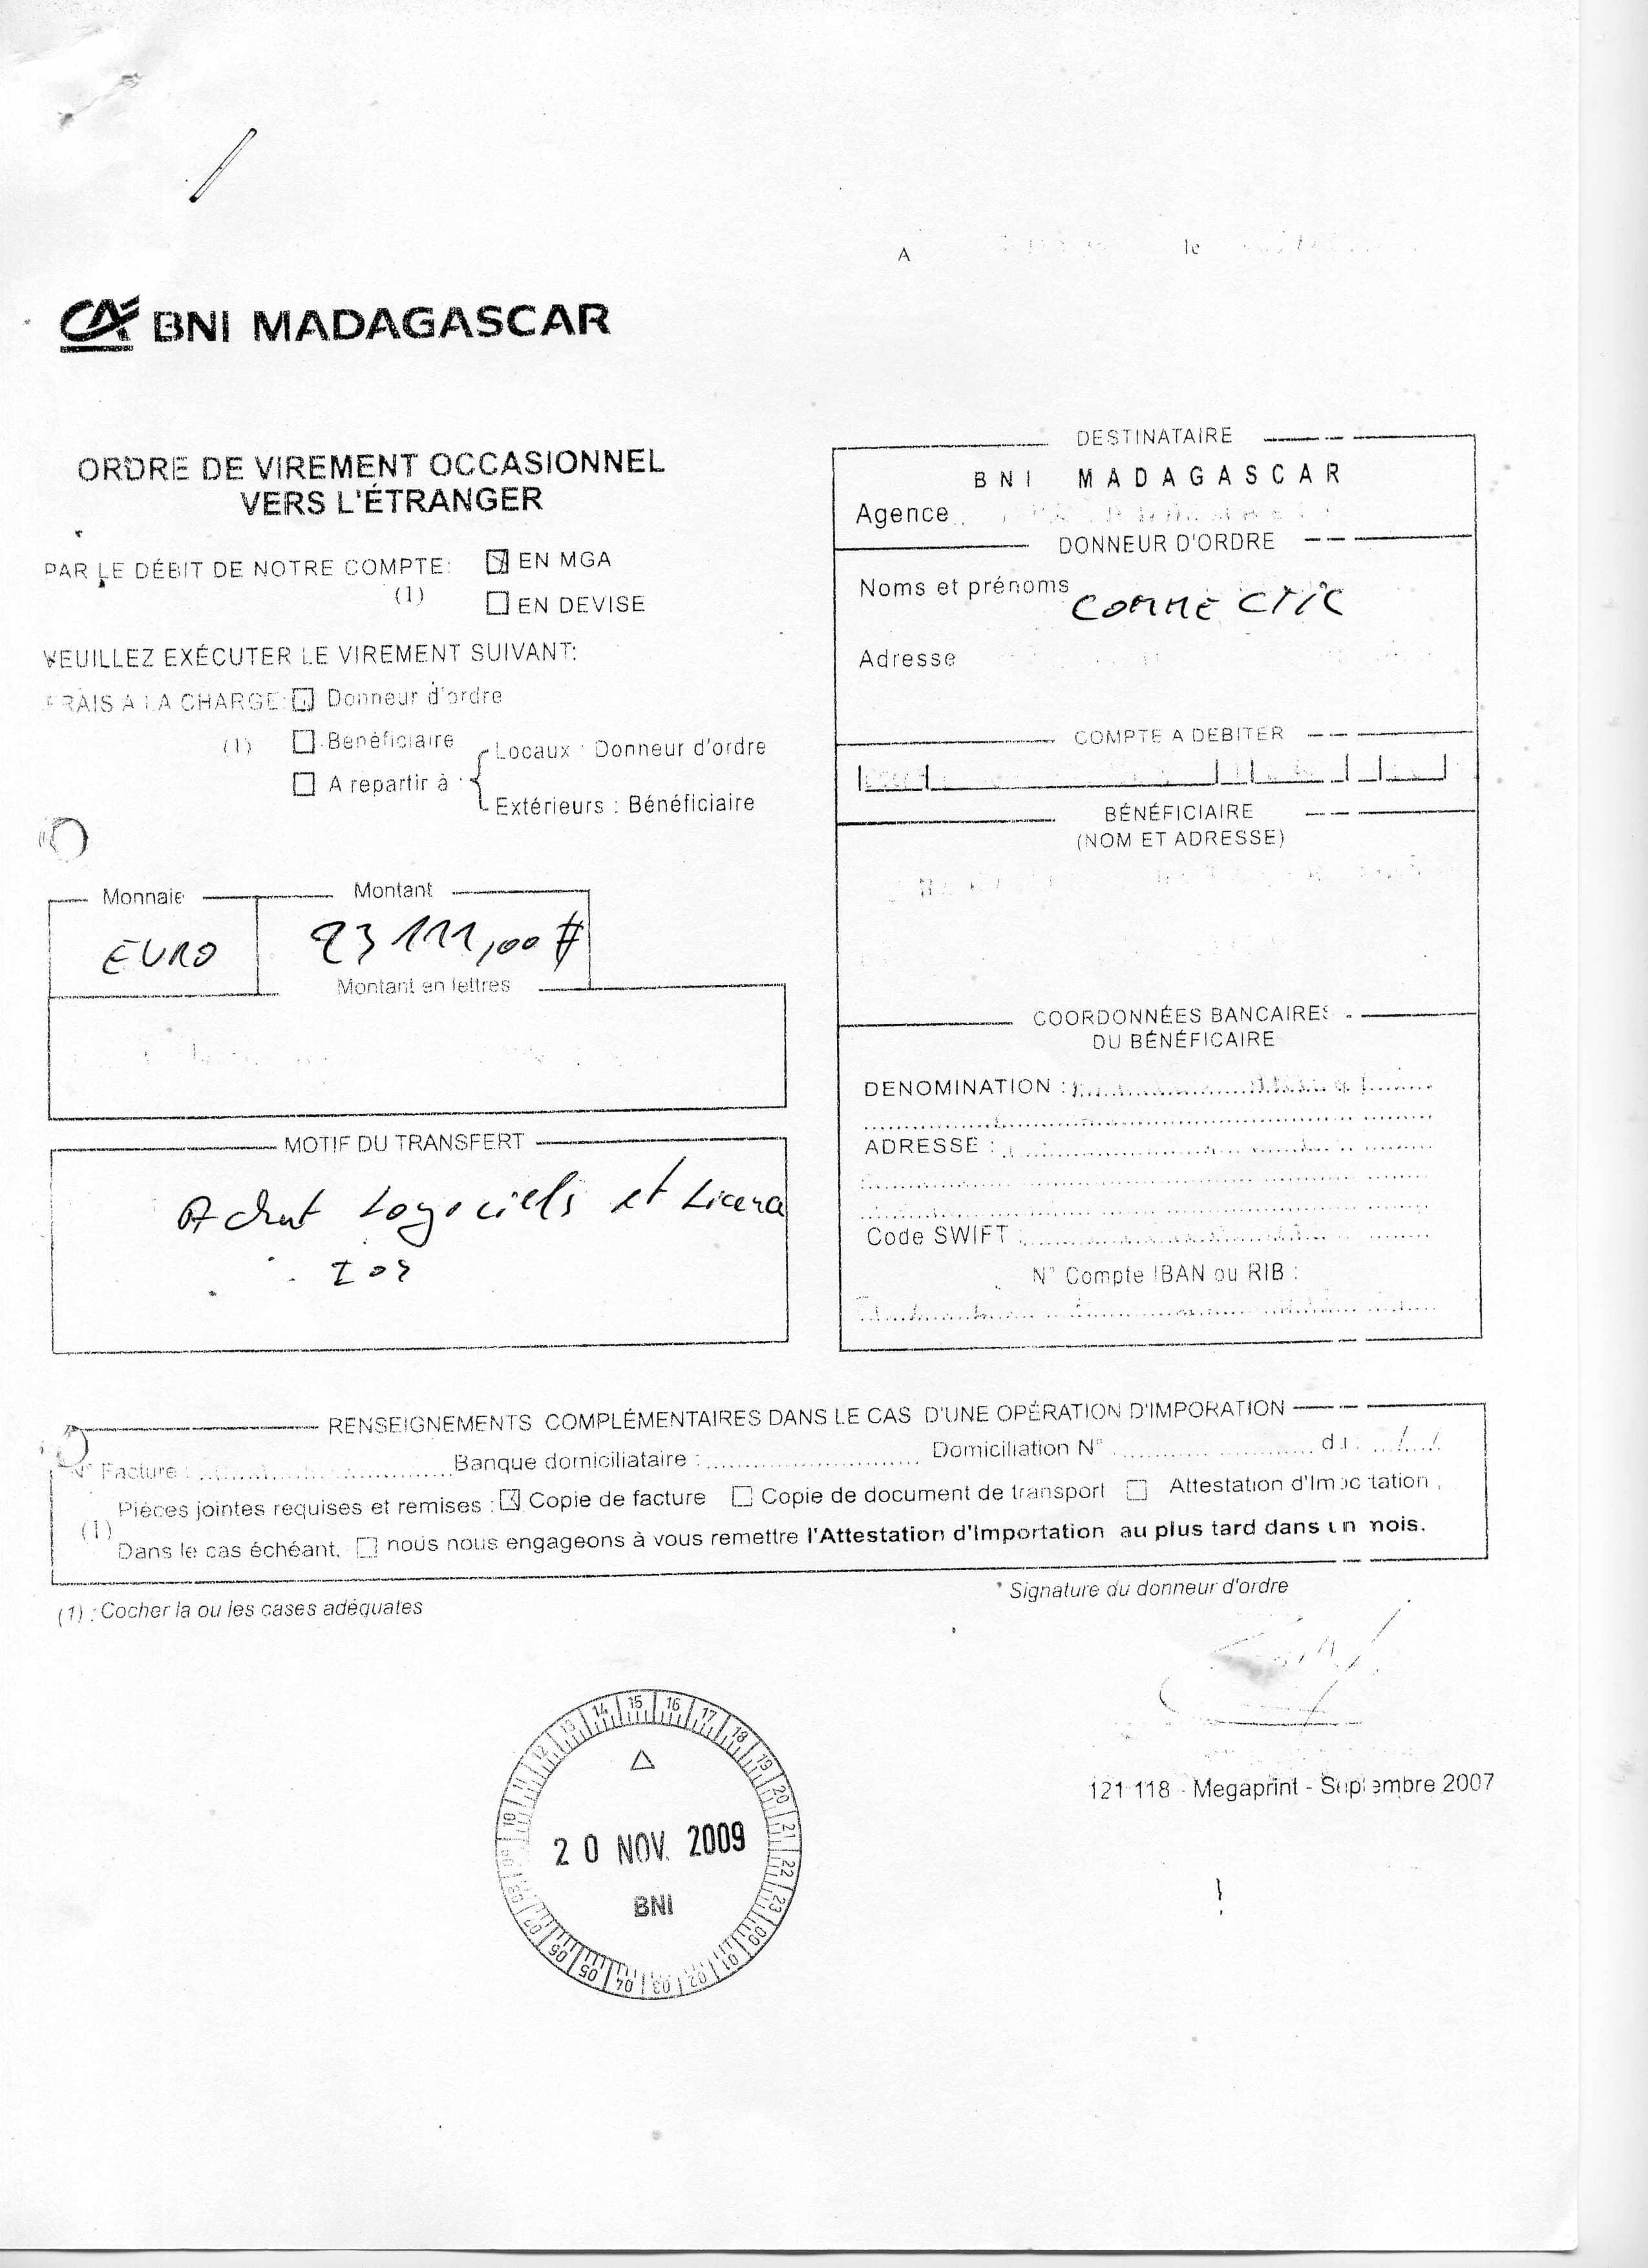 8 me virement international de euros du 23 novembre 2009 de connectic vers emergent. Black Bedroom Furniture Sets. Home Design Ideas